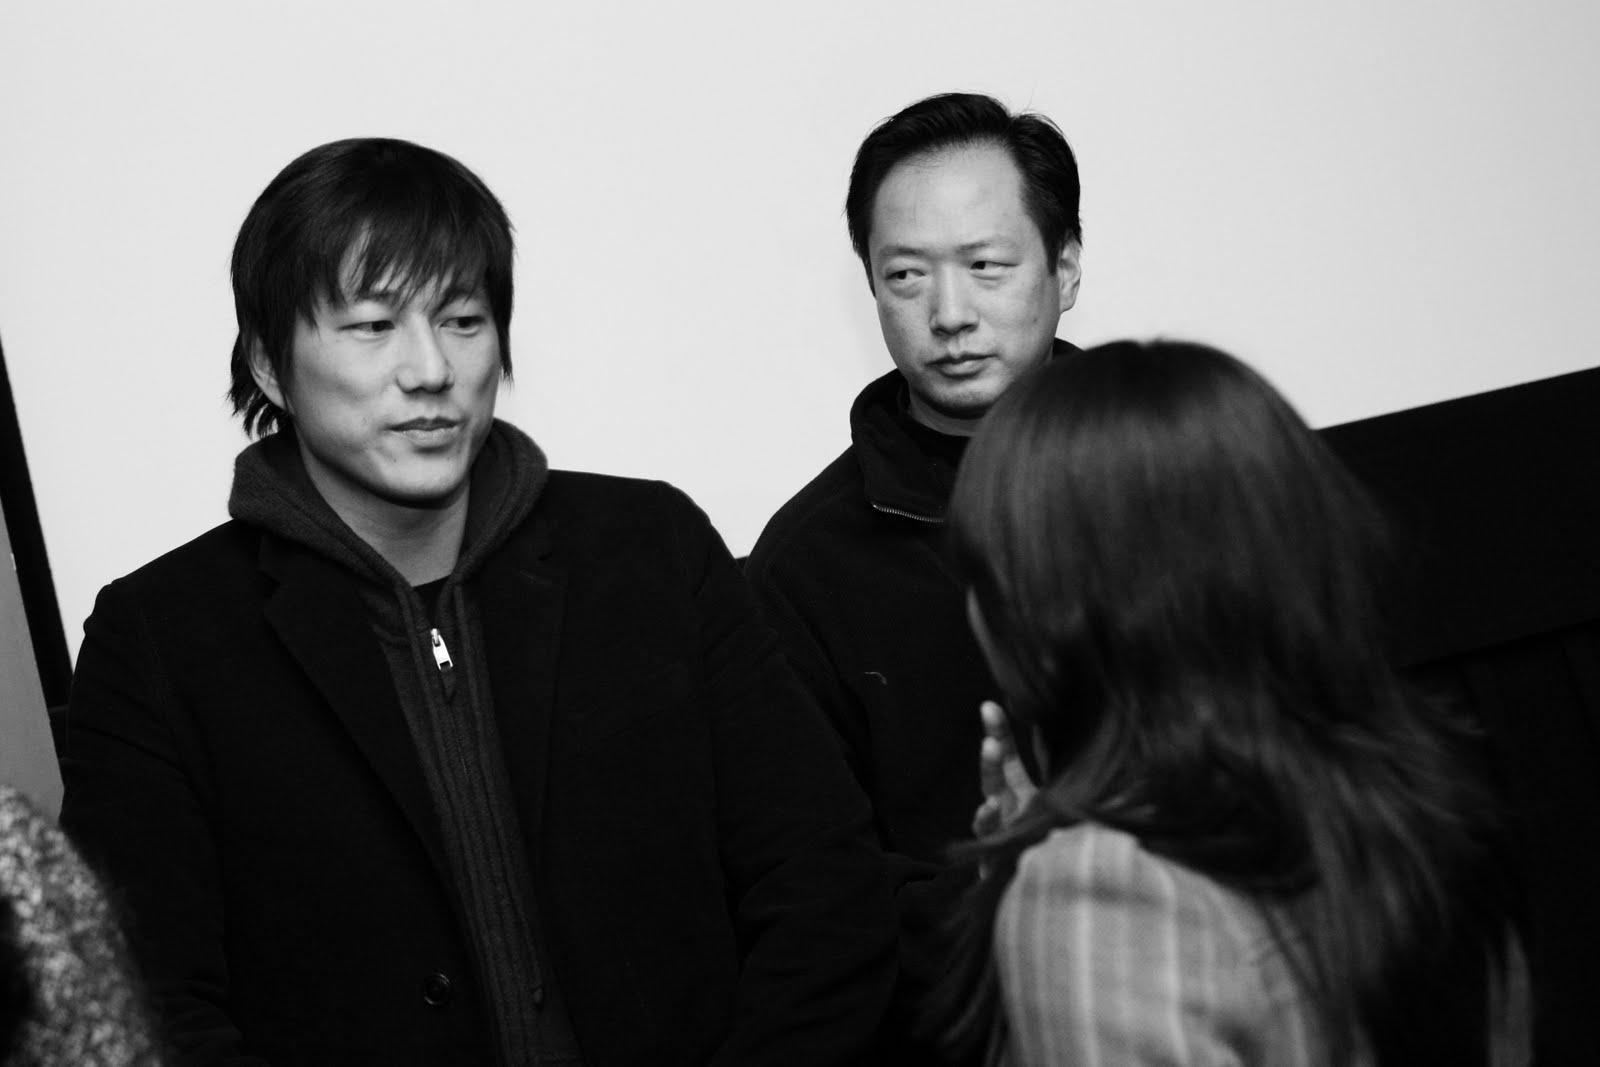 Sung Kang Daisuki: From my old stock...